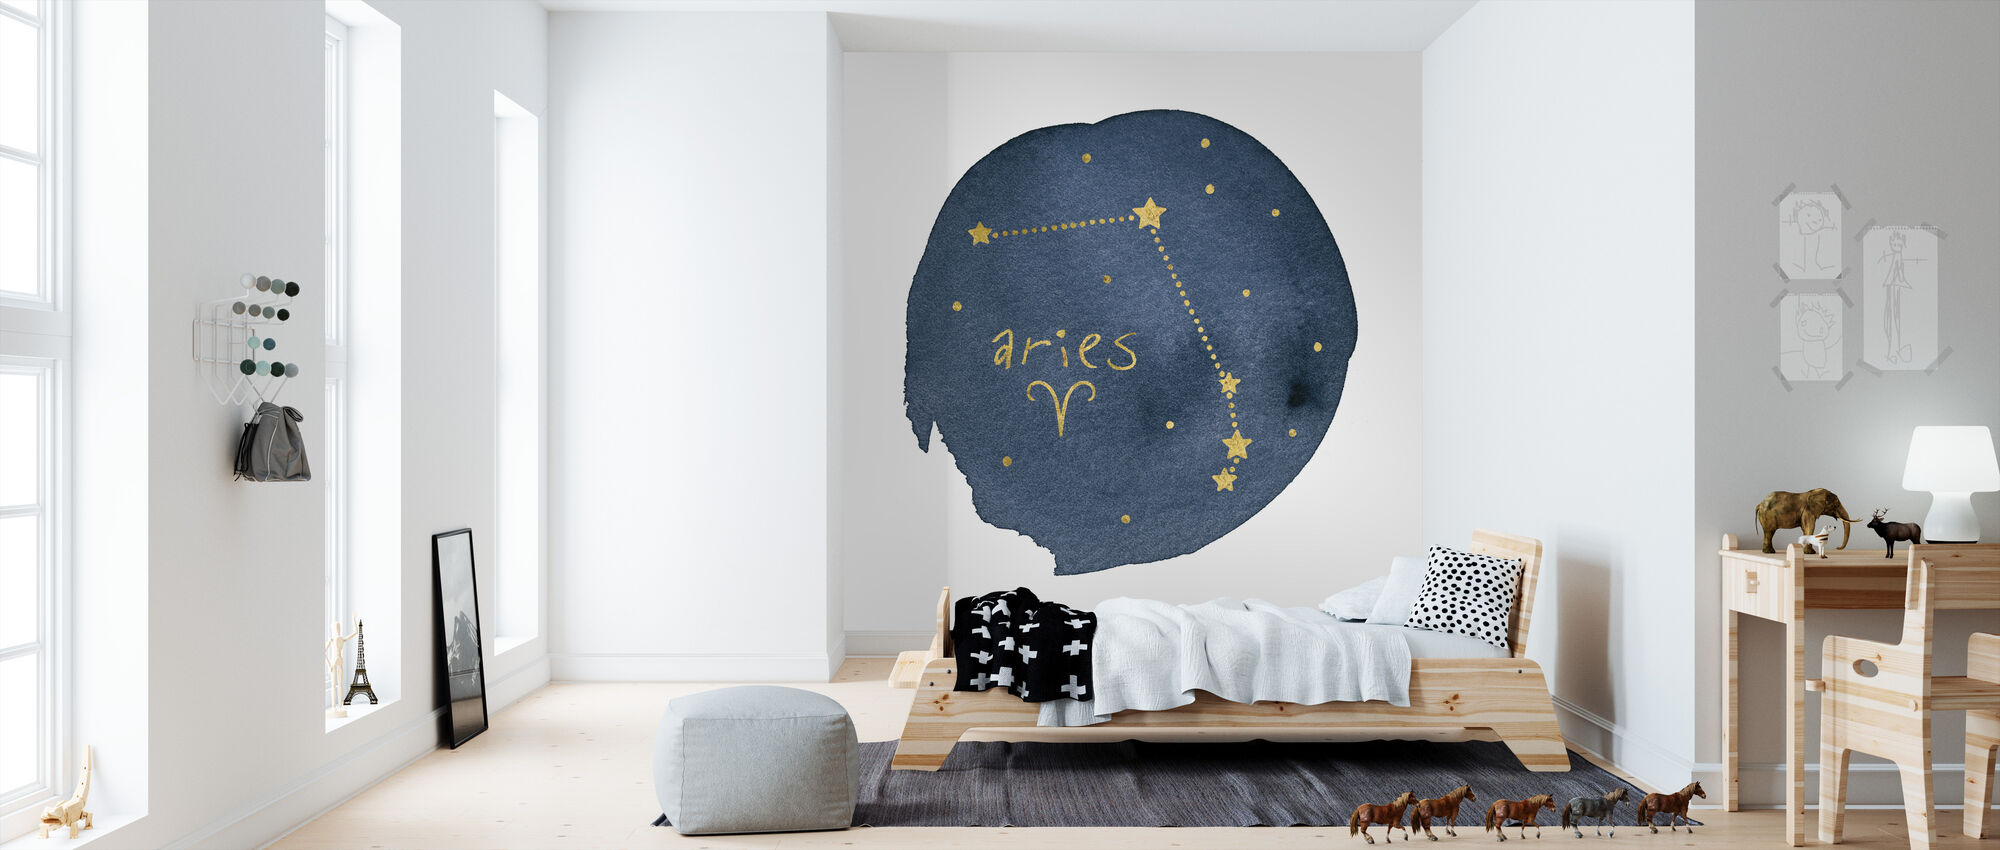 Horoscope Aries - Wallpaper - Kids Room